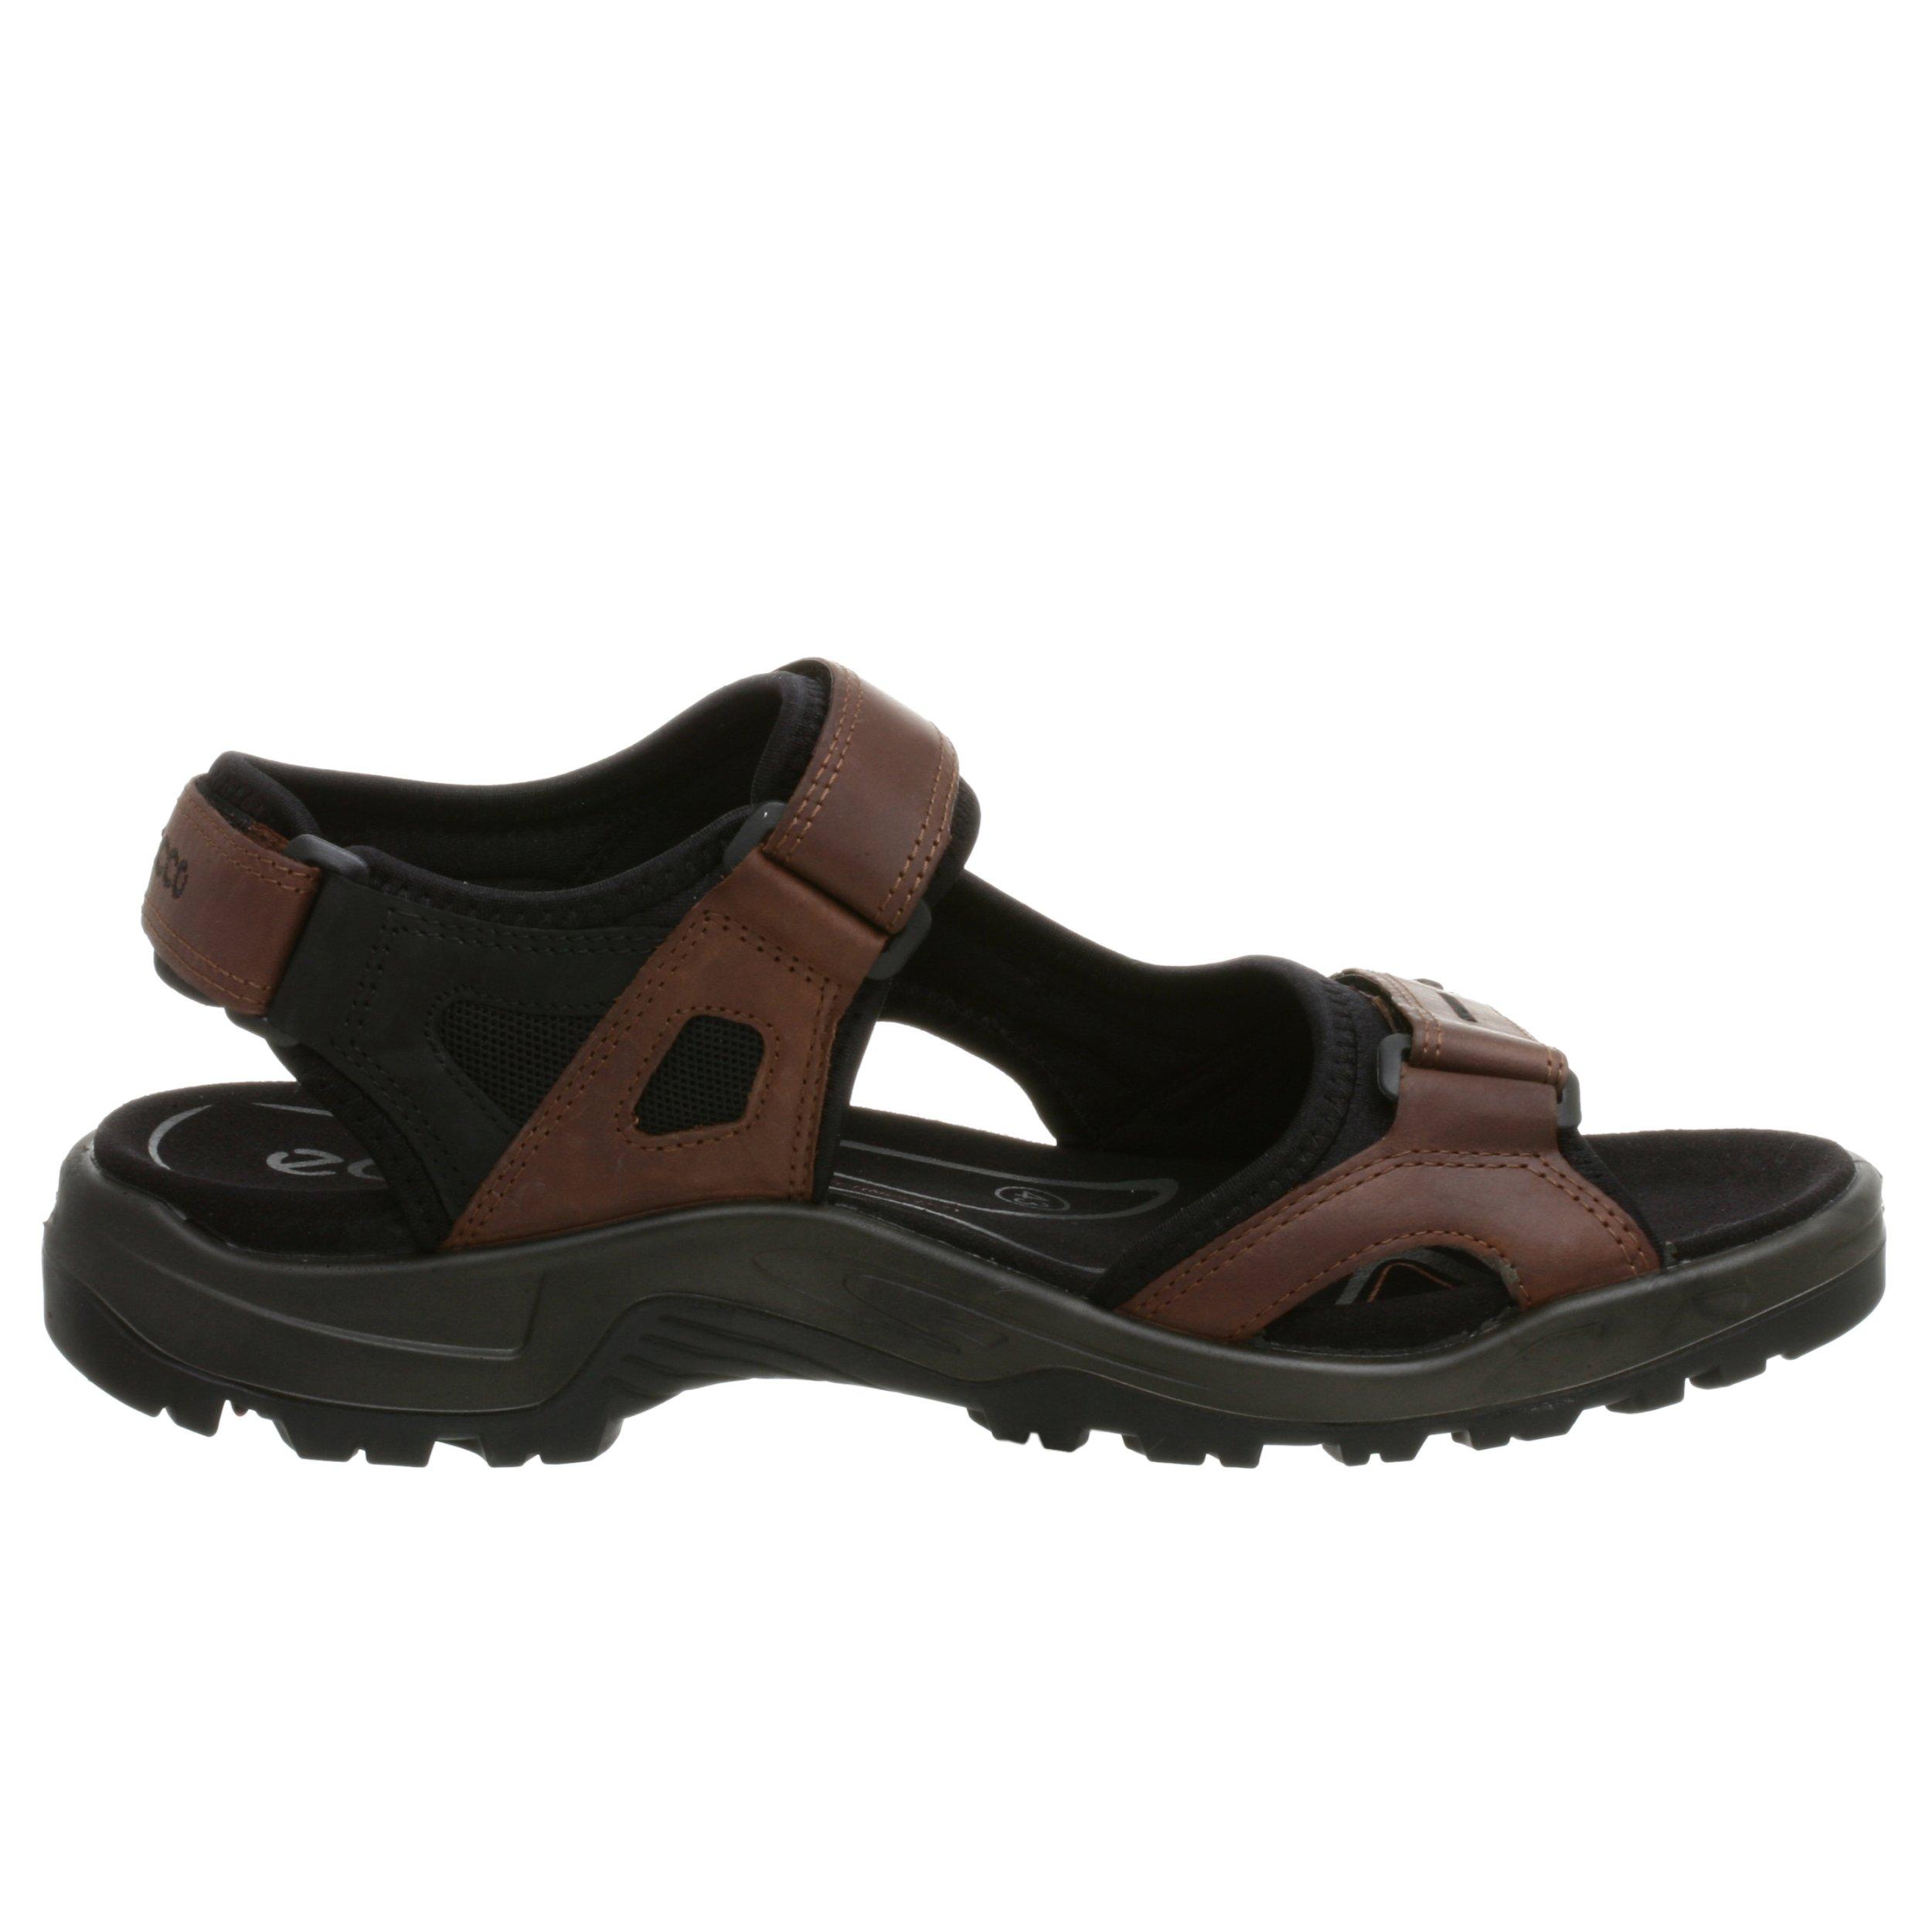 ECCO Men's Yucatan Sandal,Bison/Black/Black,44 EU (US Men's 10-10.5 M) by ECCO (Image #6)